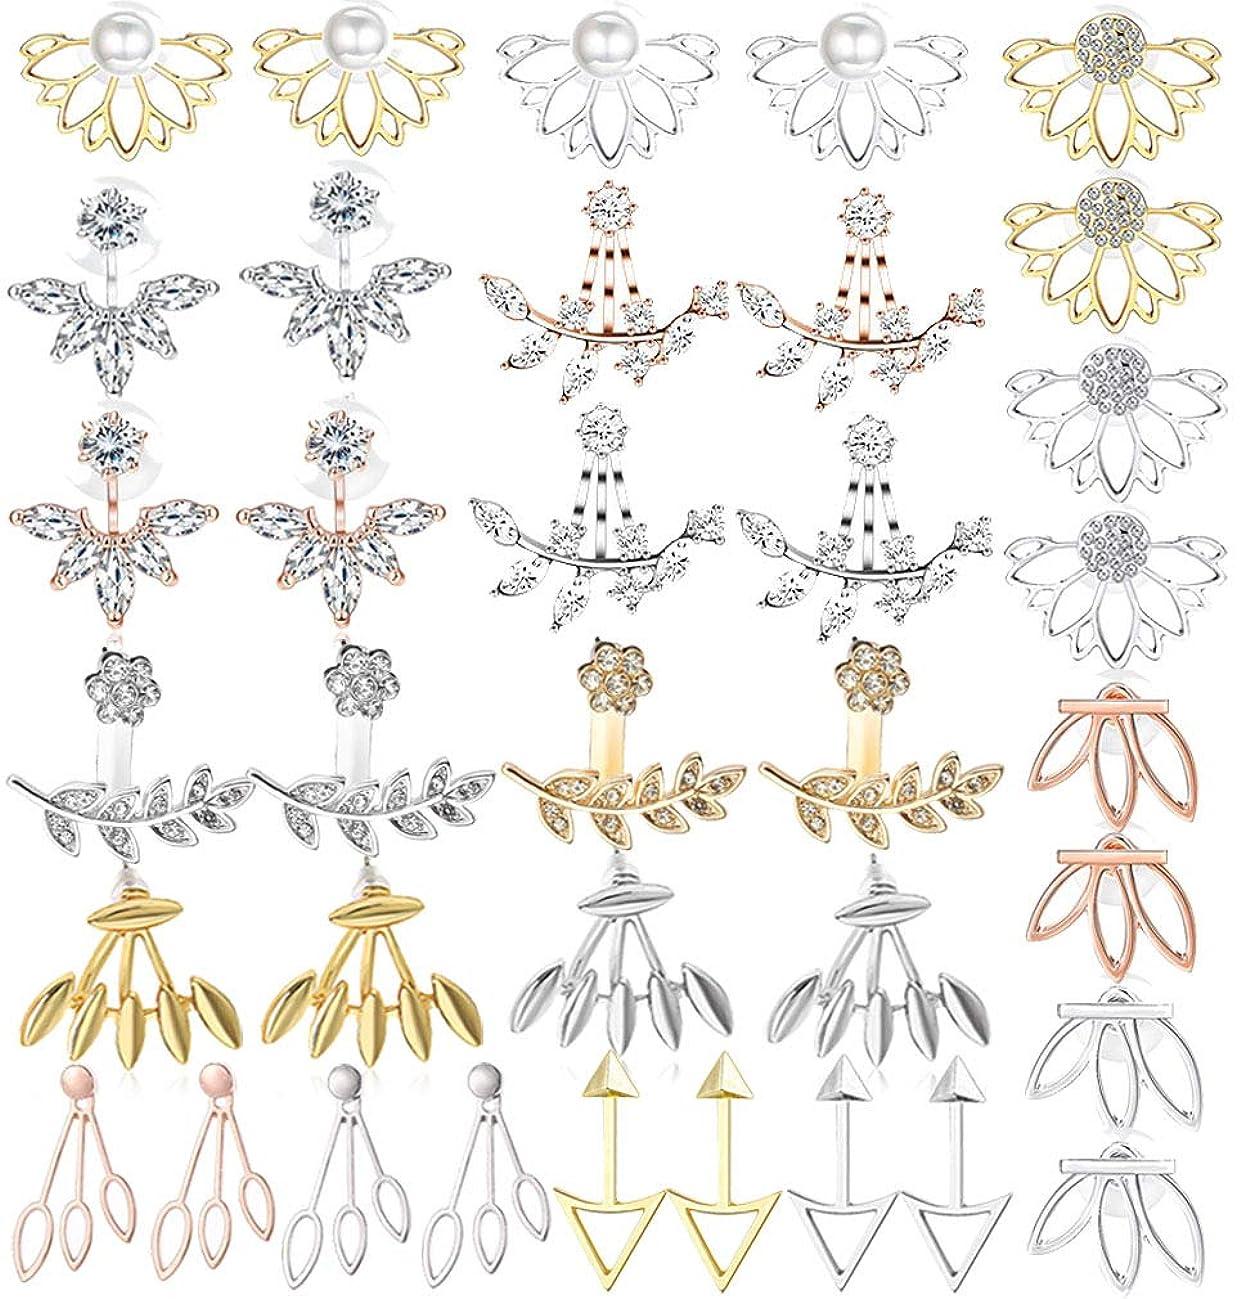 WAINIS 18Pairs Multiple Dainty Lotus Flower Ear Jacket Stud Earrings for Women and Girls Boho Chic Cz Stud Ear Jewelry Earring Set